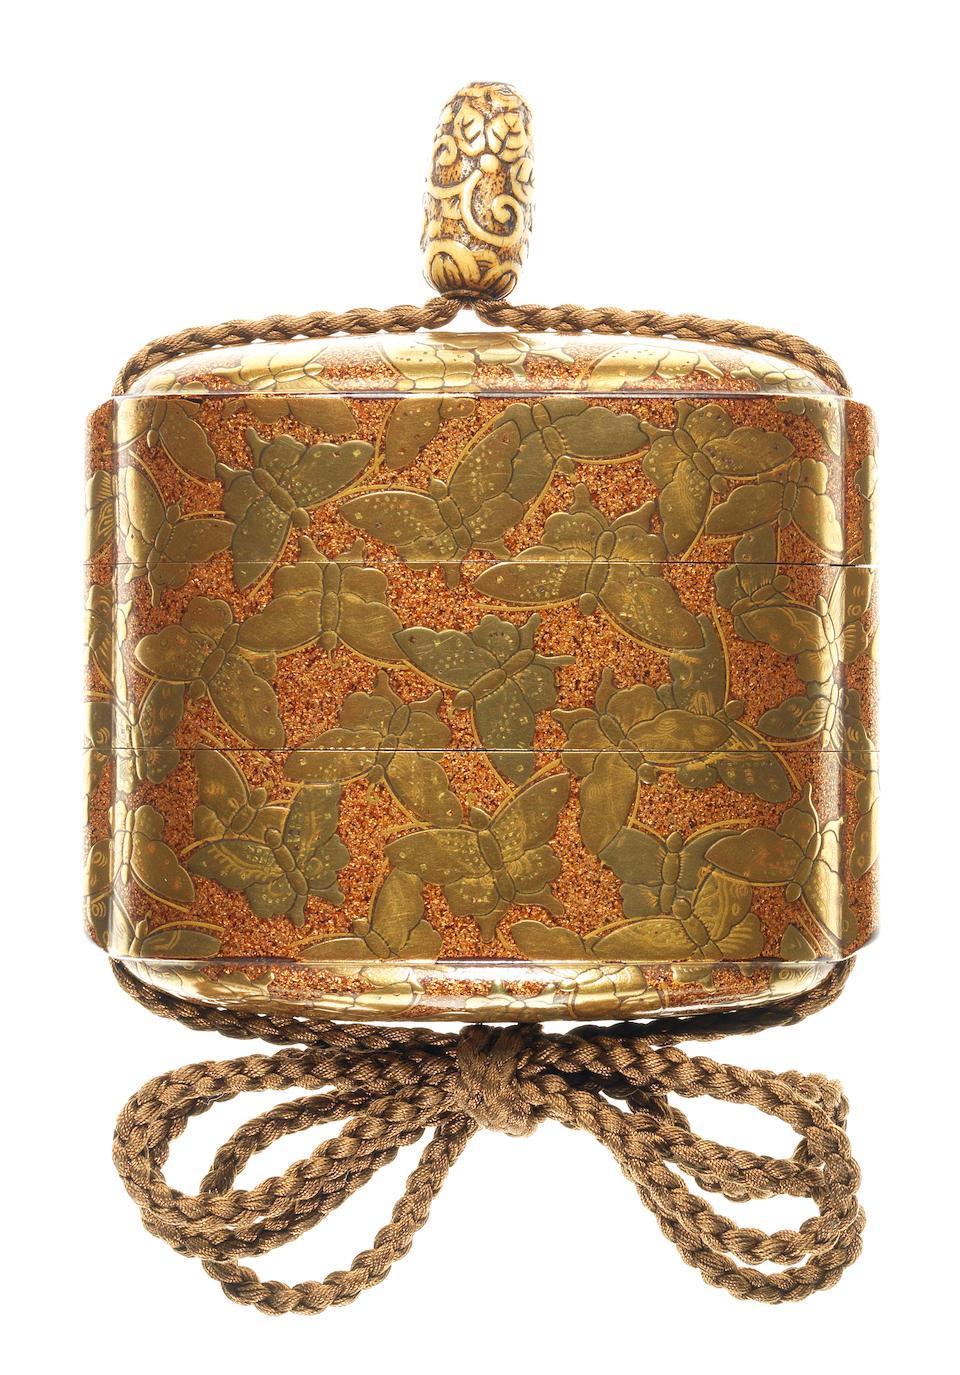 A rare gold-lacquer two-case inro  By Koami Shoho (Masamine), 18th century